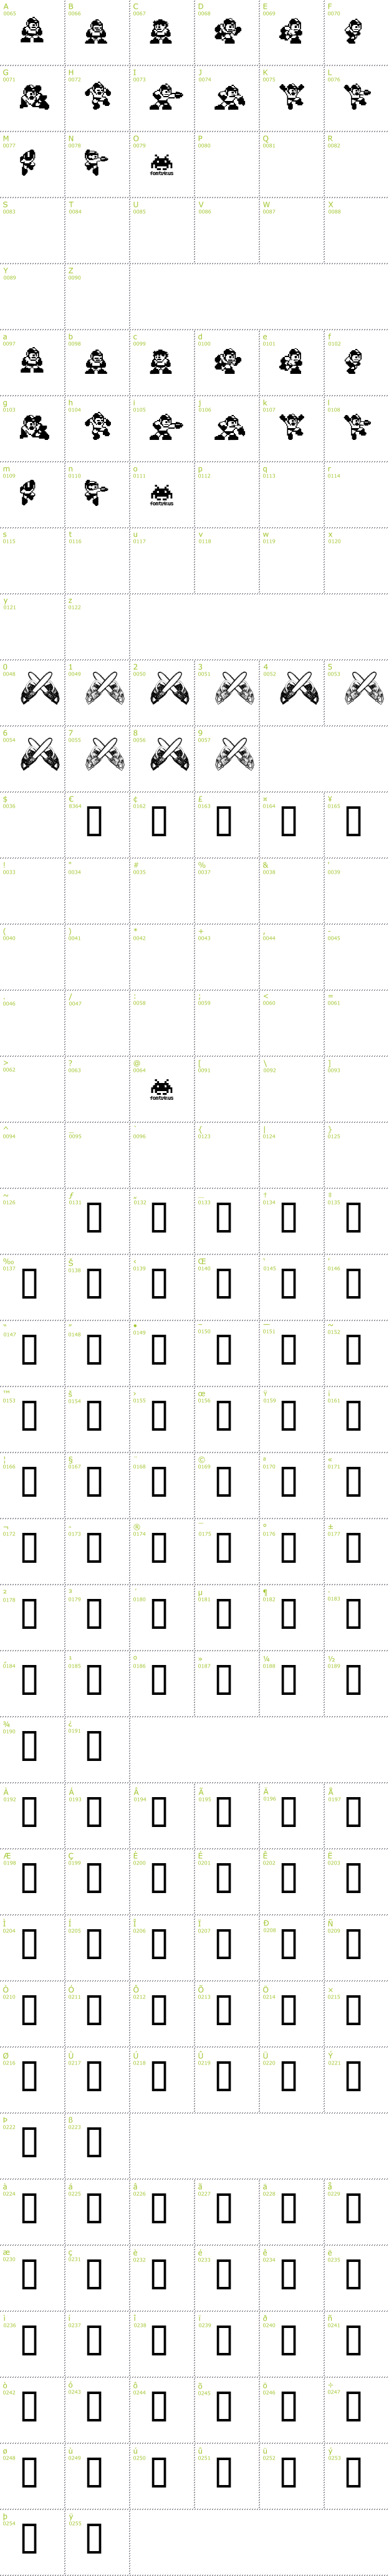 Megaman Font Full Character Map Dailyfreefonts Com